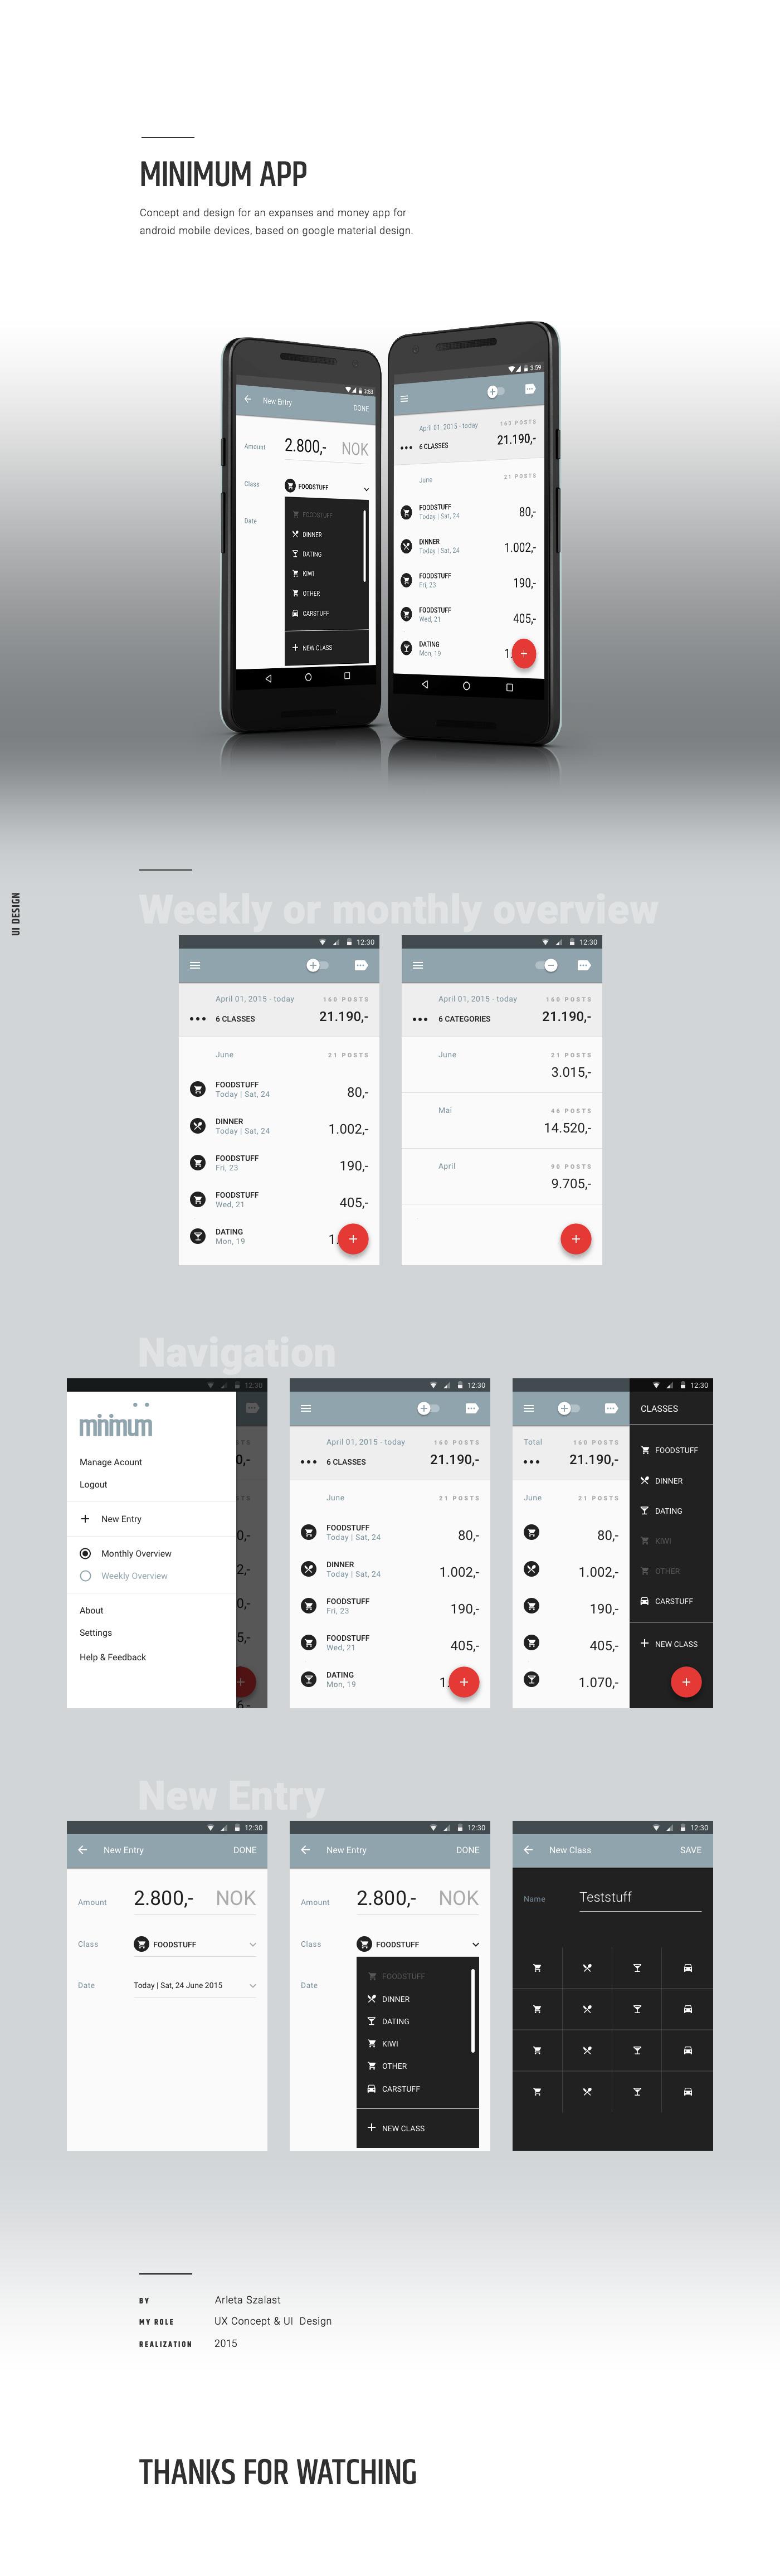 UX design ui design Interaction design  Mobile app native mobile app android application mobile interface